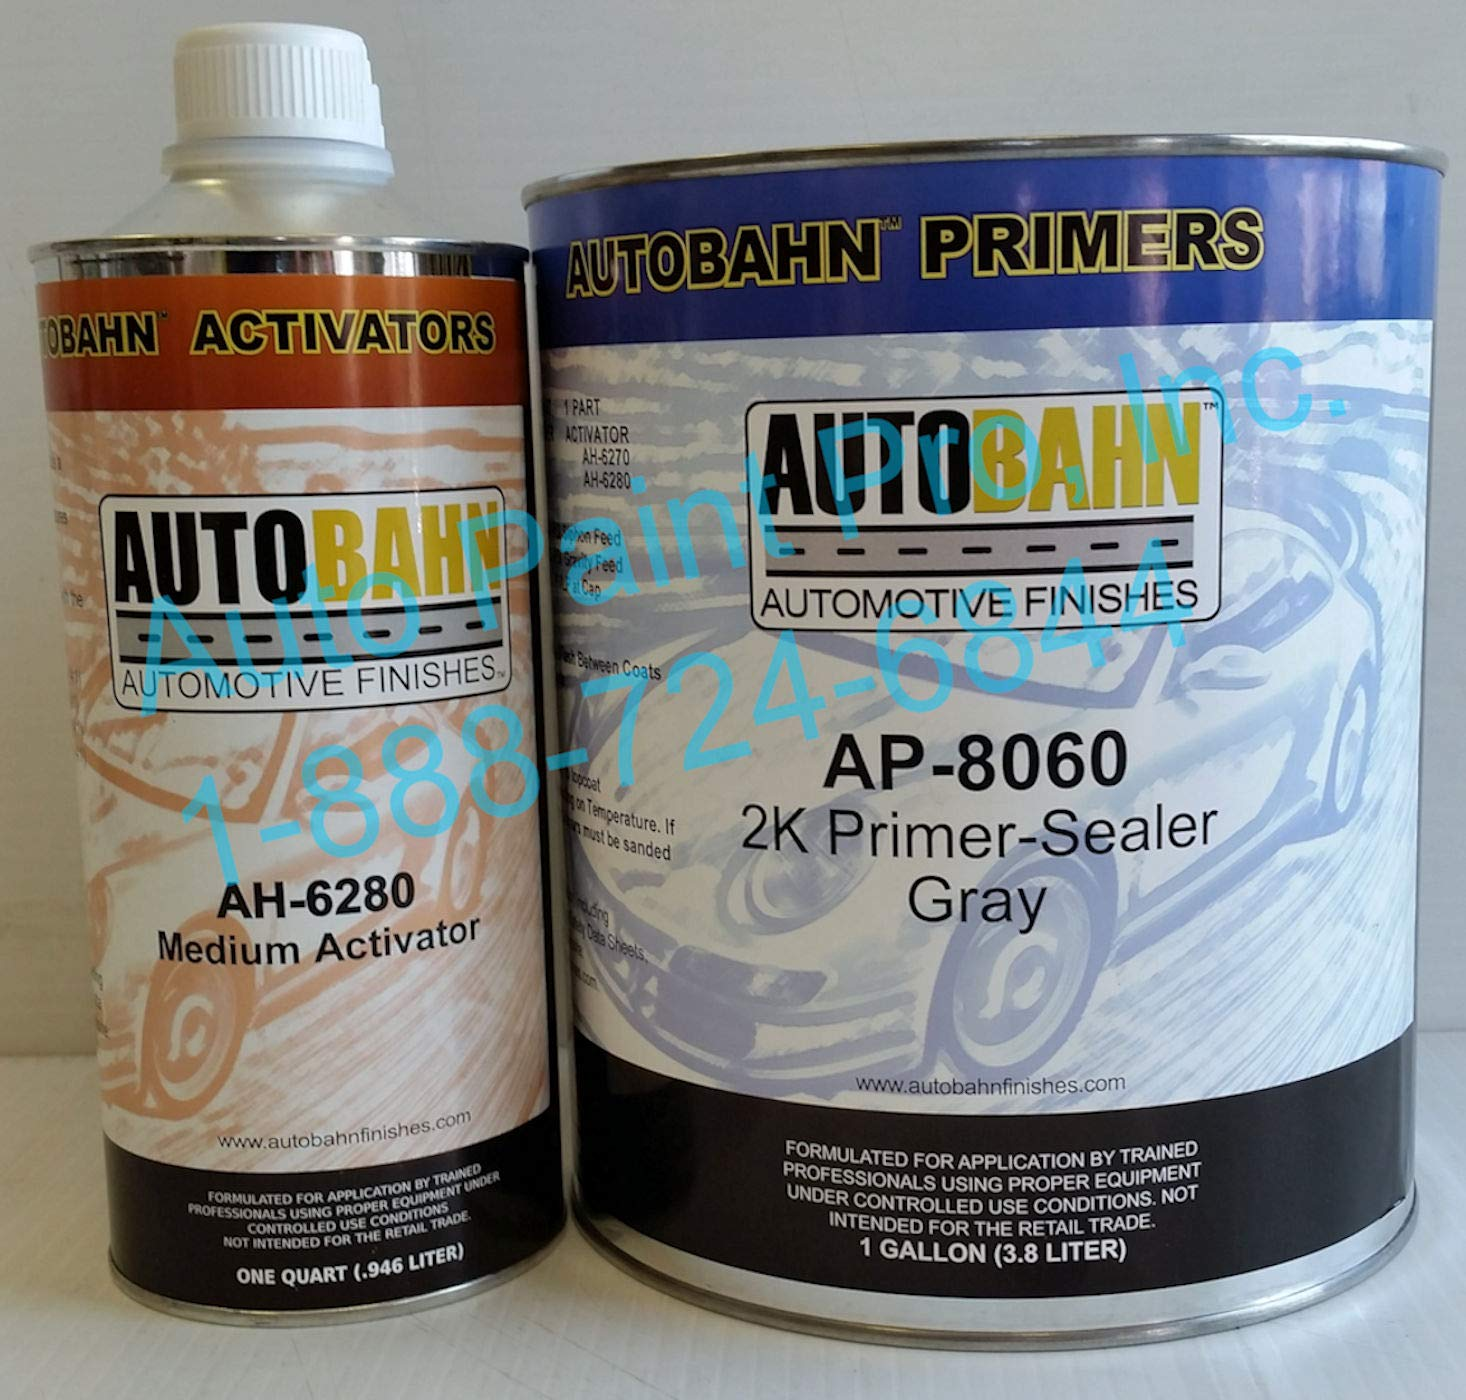 AUTOBAHN AP-8060 2K Primer Sealer Gray Restoration CAR Paint Supplies by AUTOBAHN (Image #1)